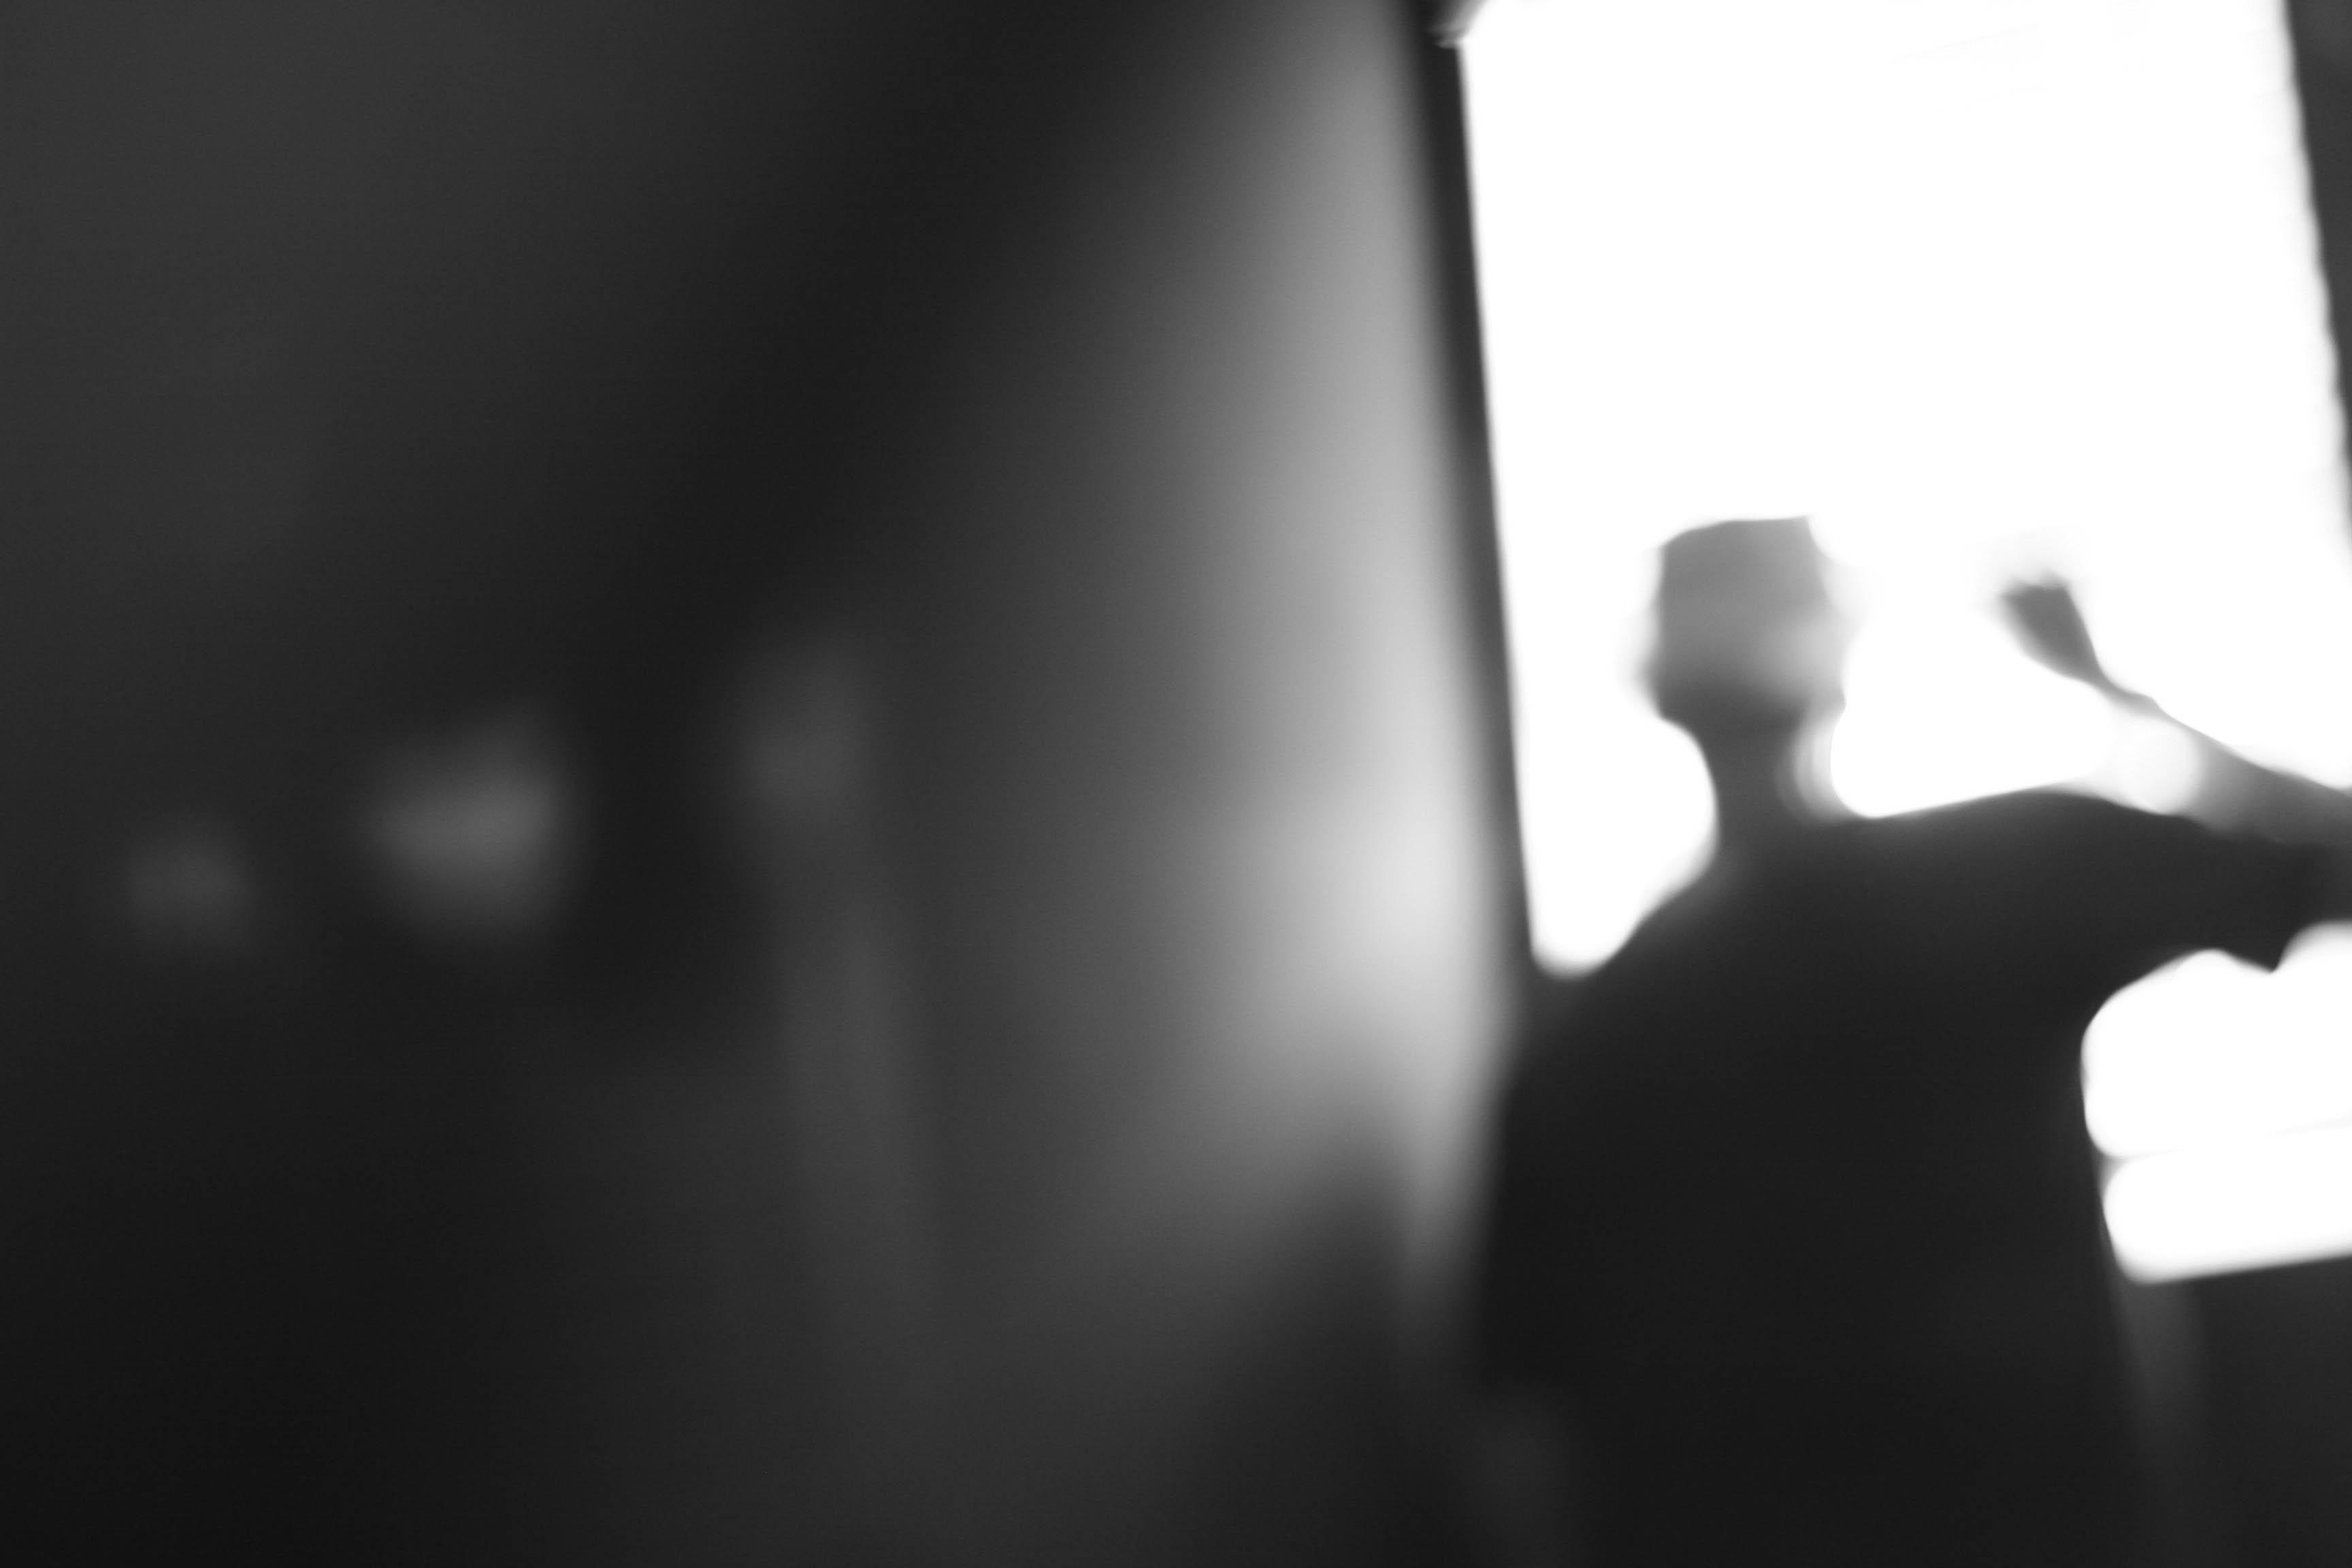 Fuzzy Memory  Film Noir by Qballthe5th 3456x2304